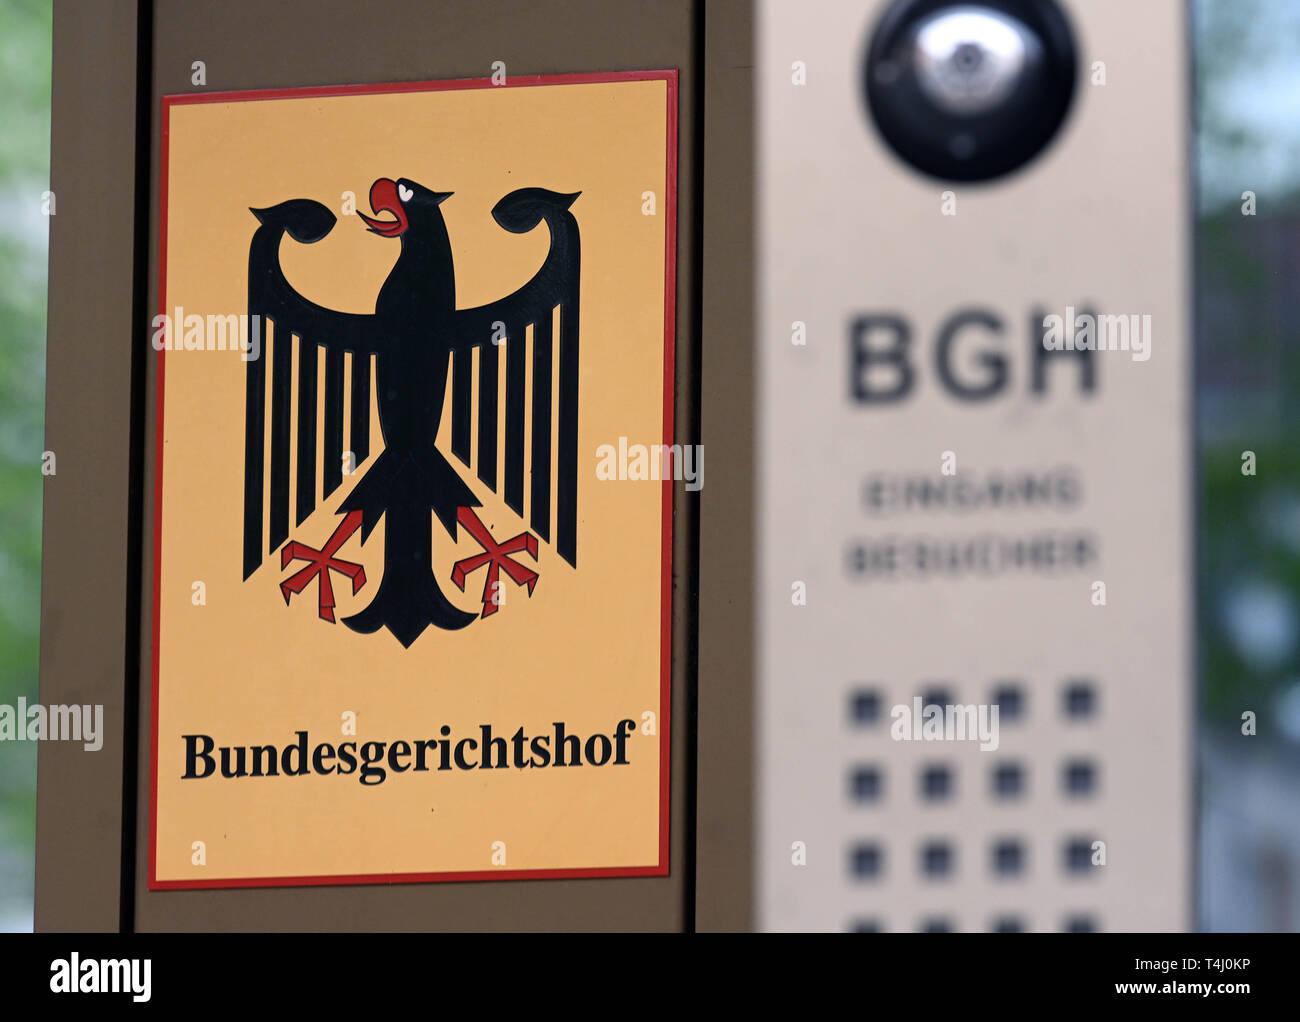 17 April 2019, Baden-Wuerttemberg, Karlsruhe: Before the Federal